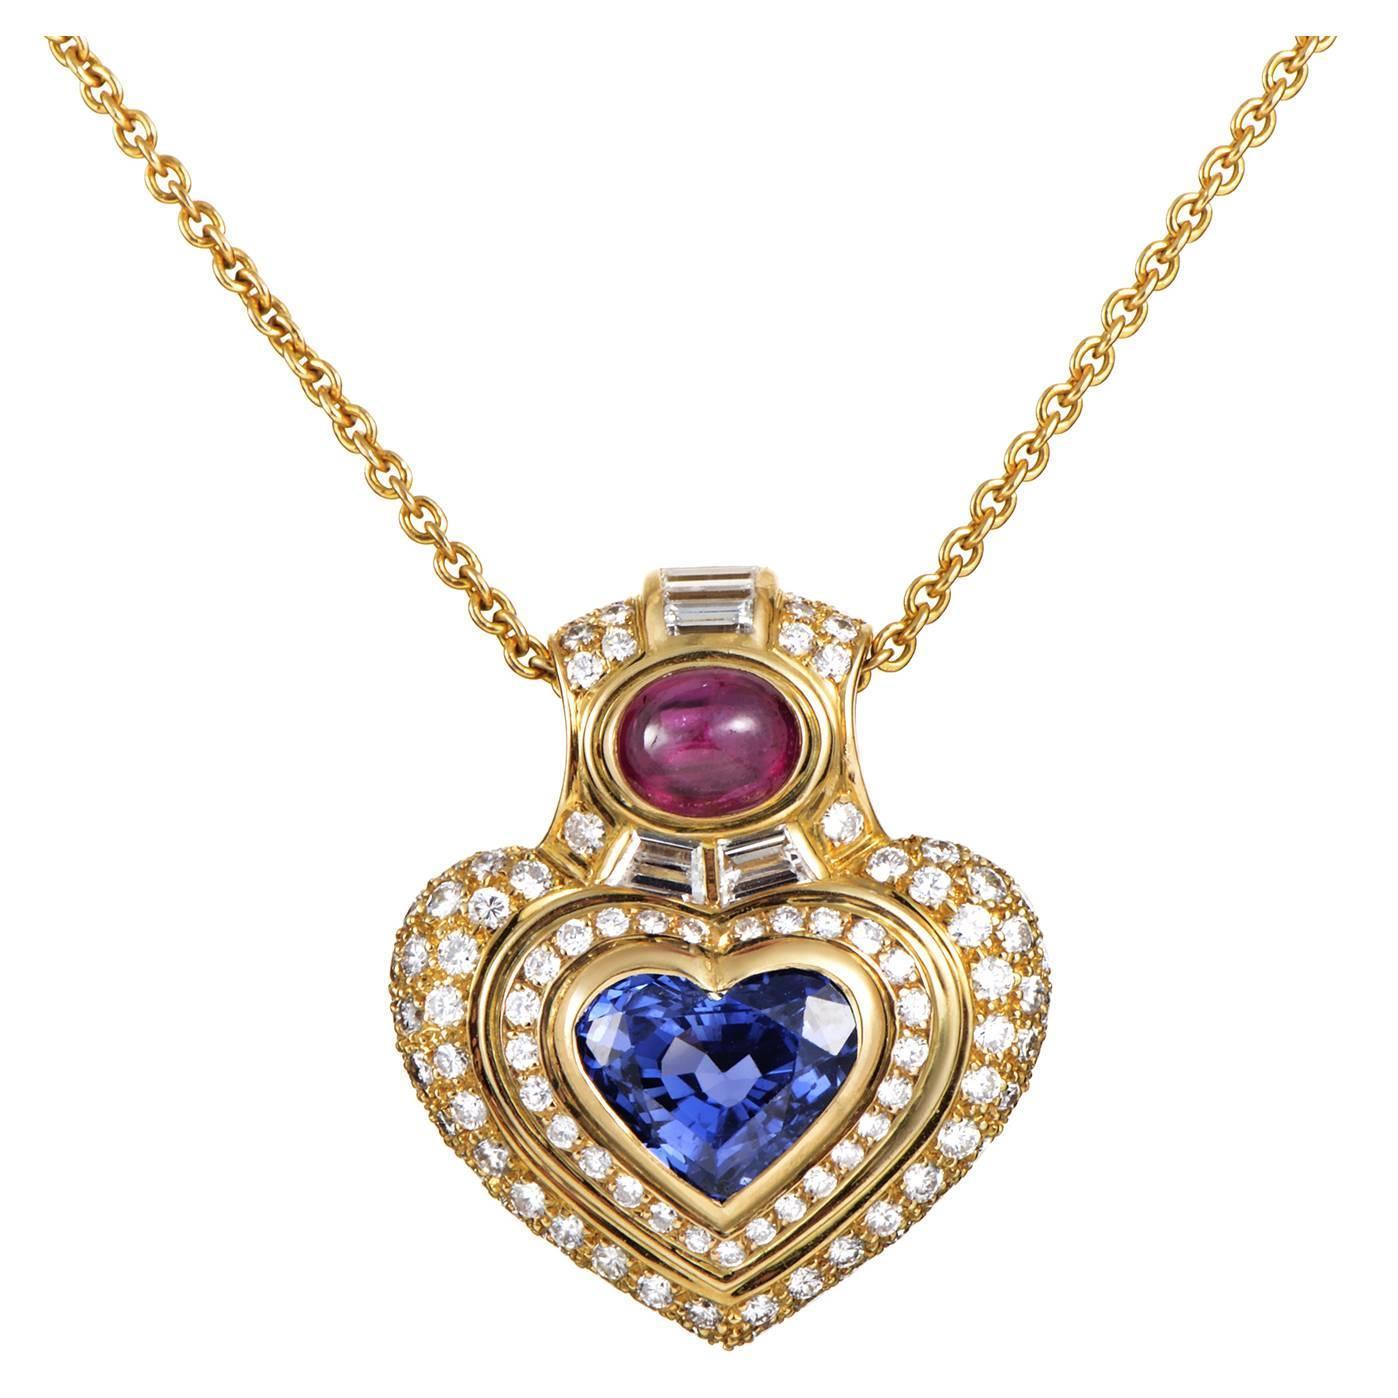 bulgari precious gemstone gold pendant necklace at